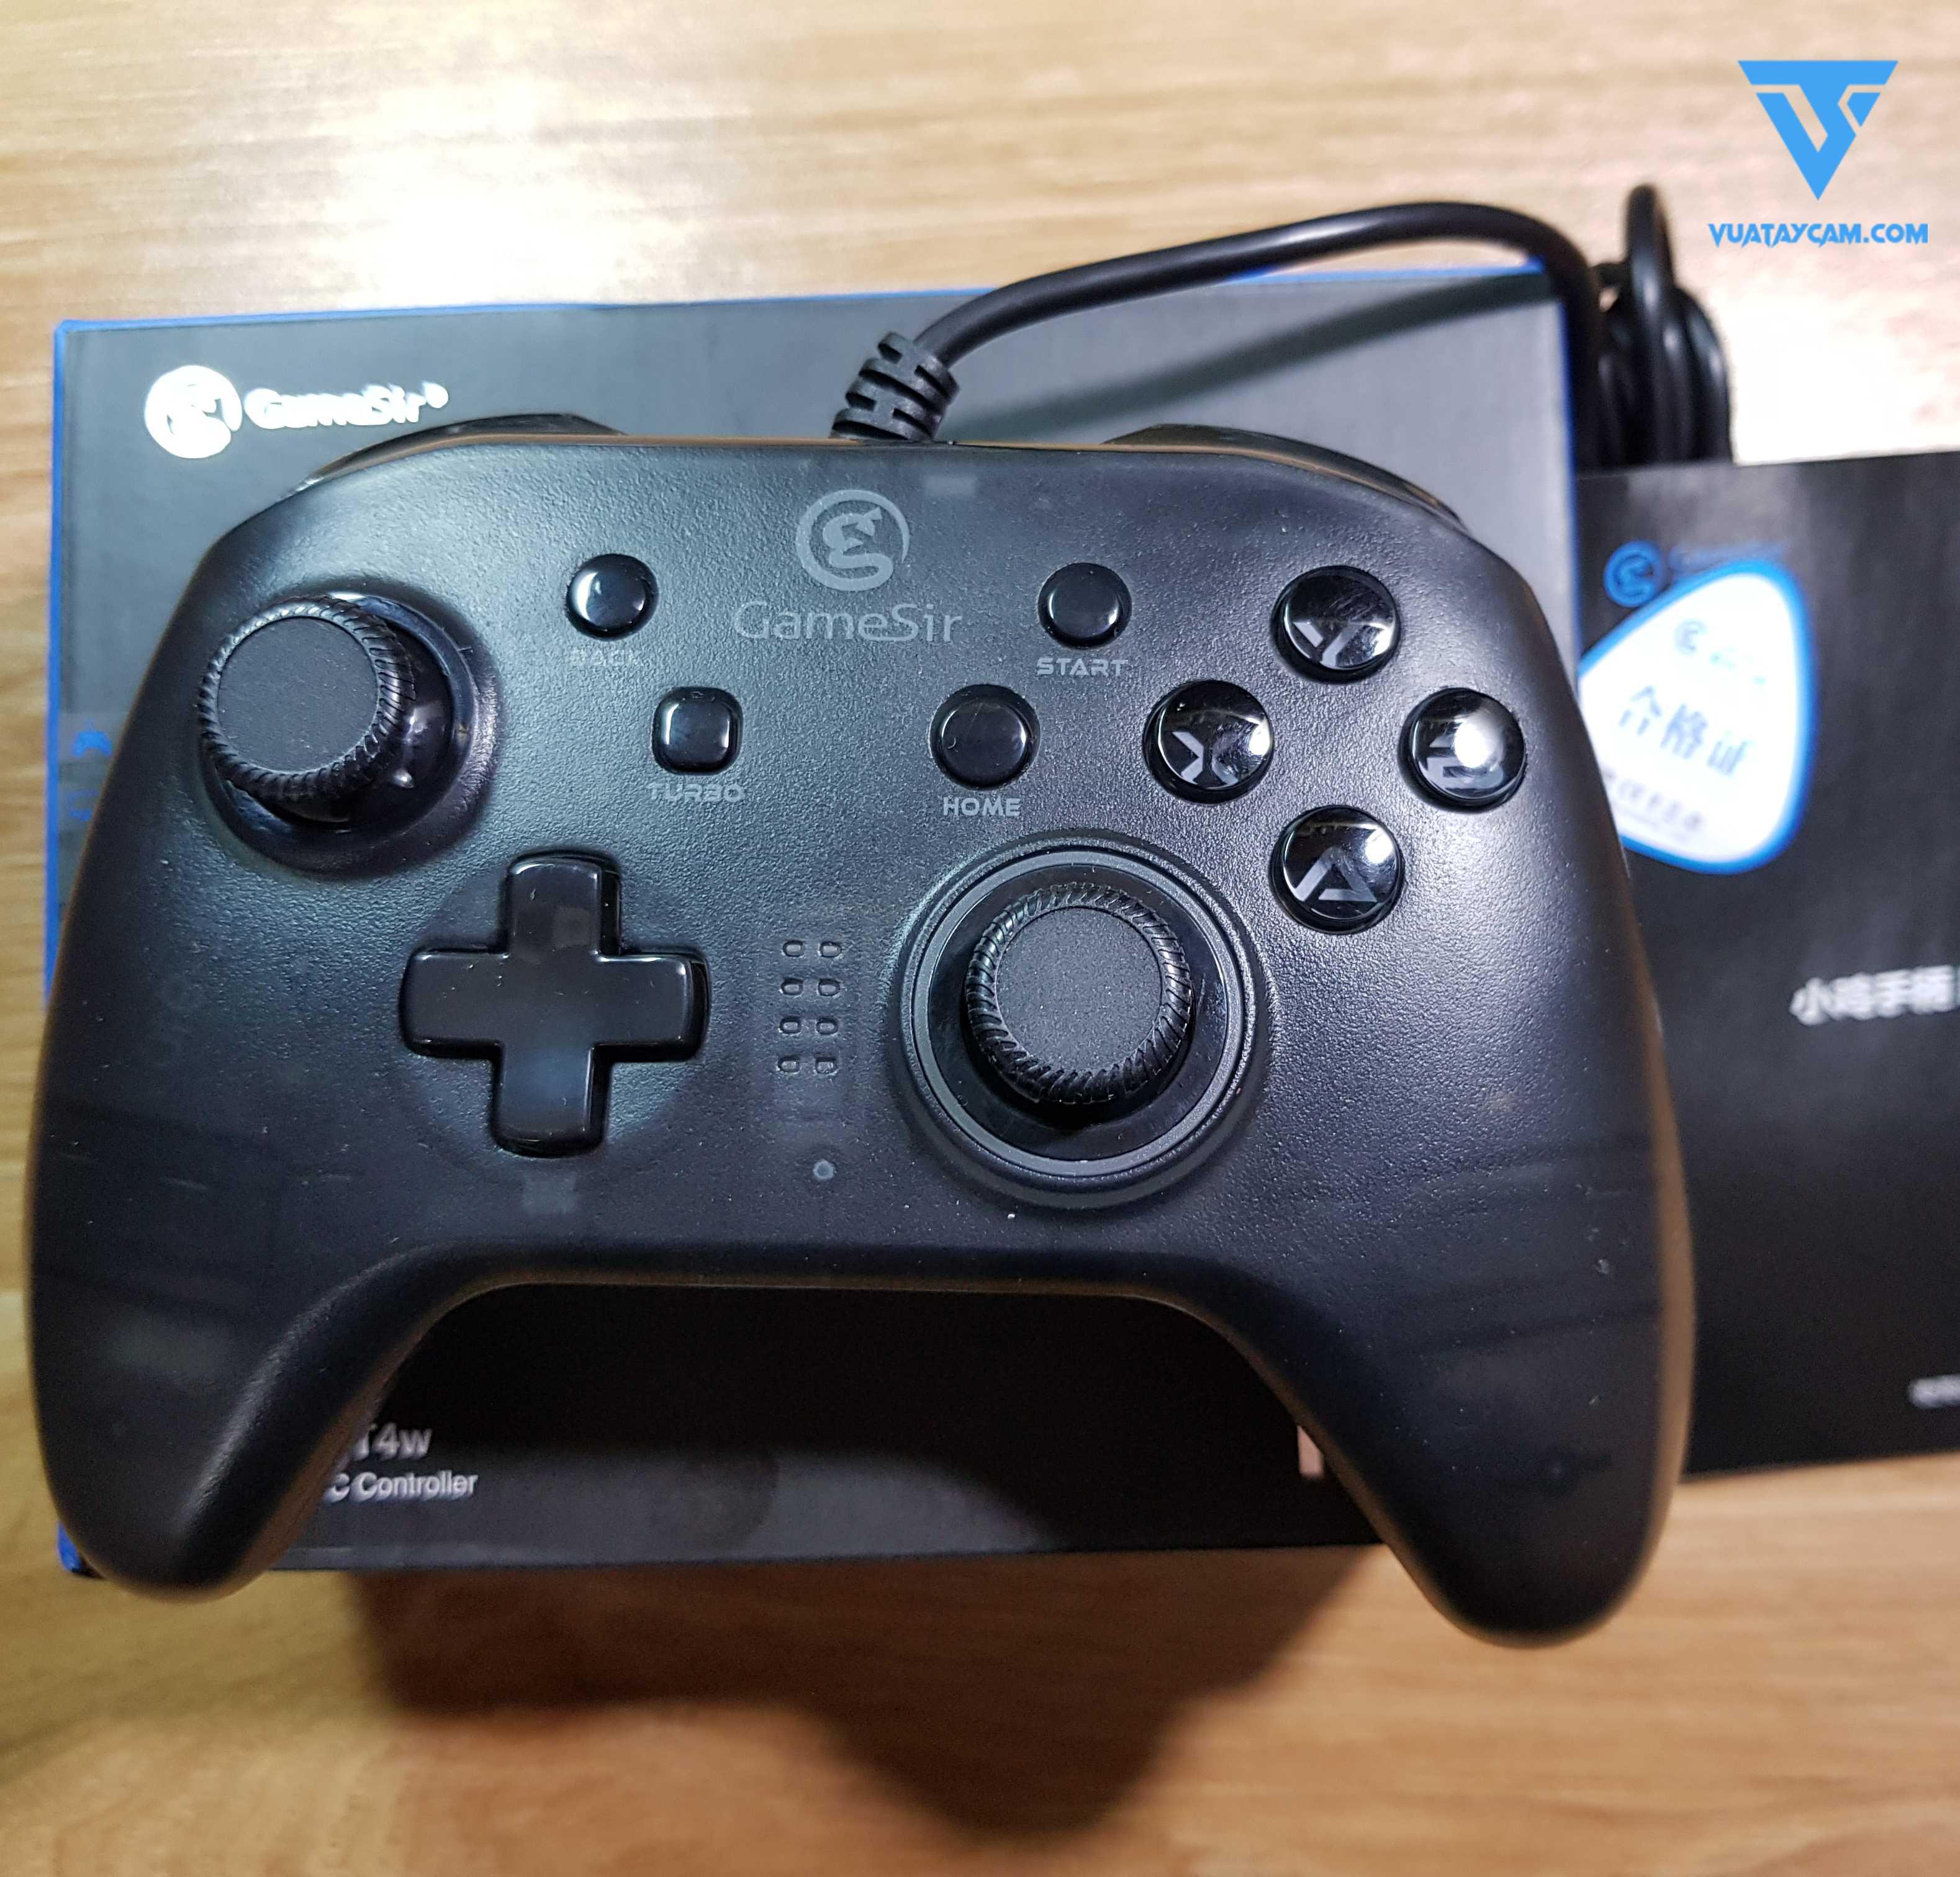 https://api.vuataycam.com/file/1602090365576-381153505-tay-cam-choi-game-gamesir-t4w-1.jpg